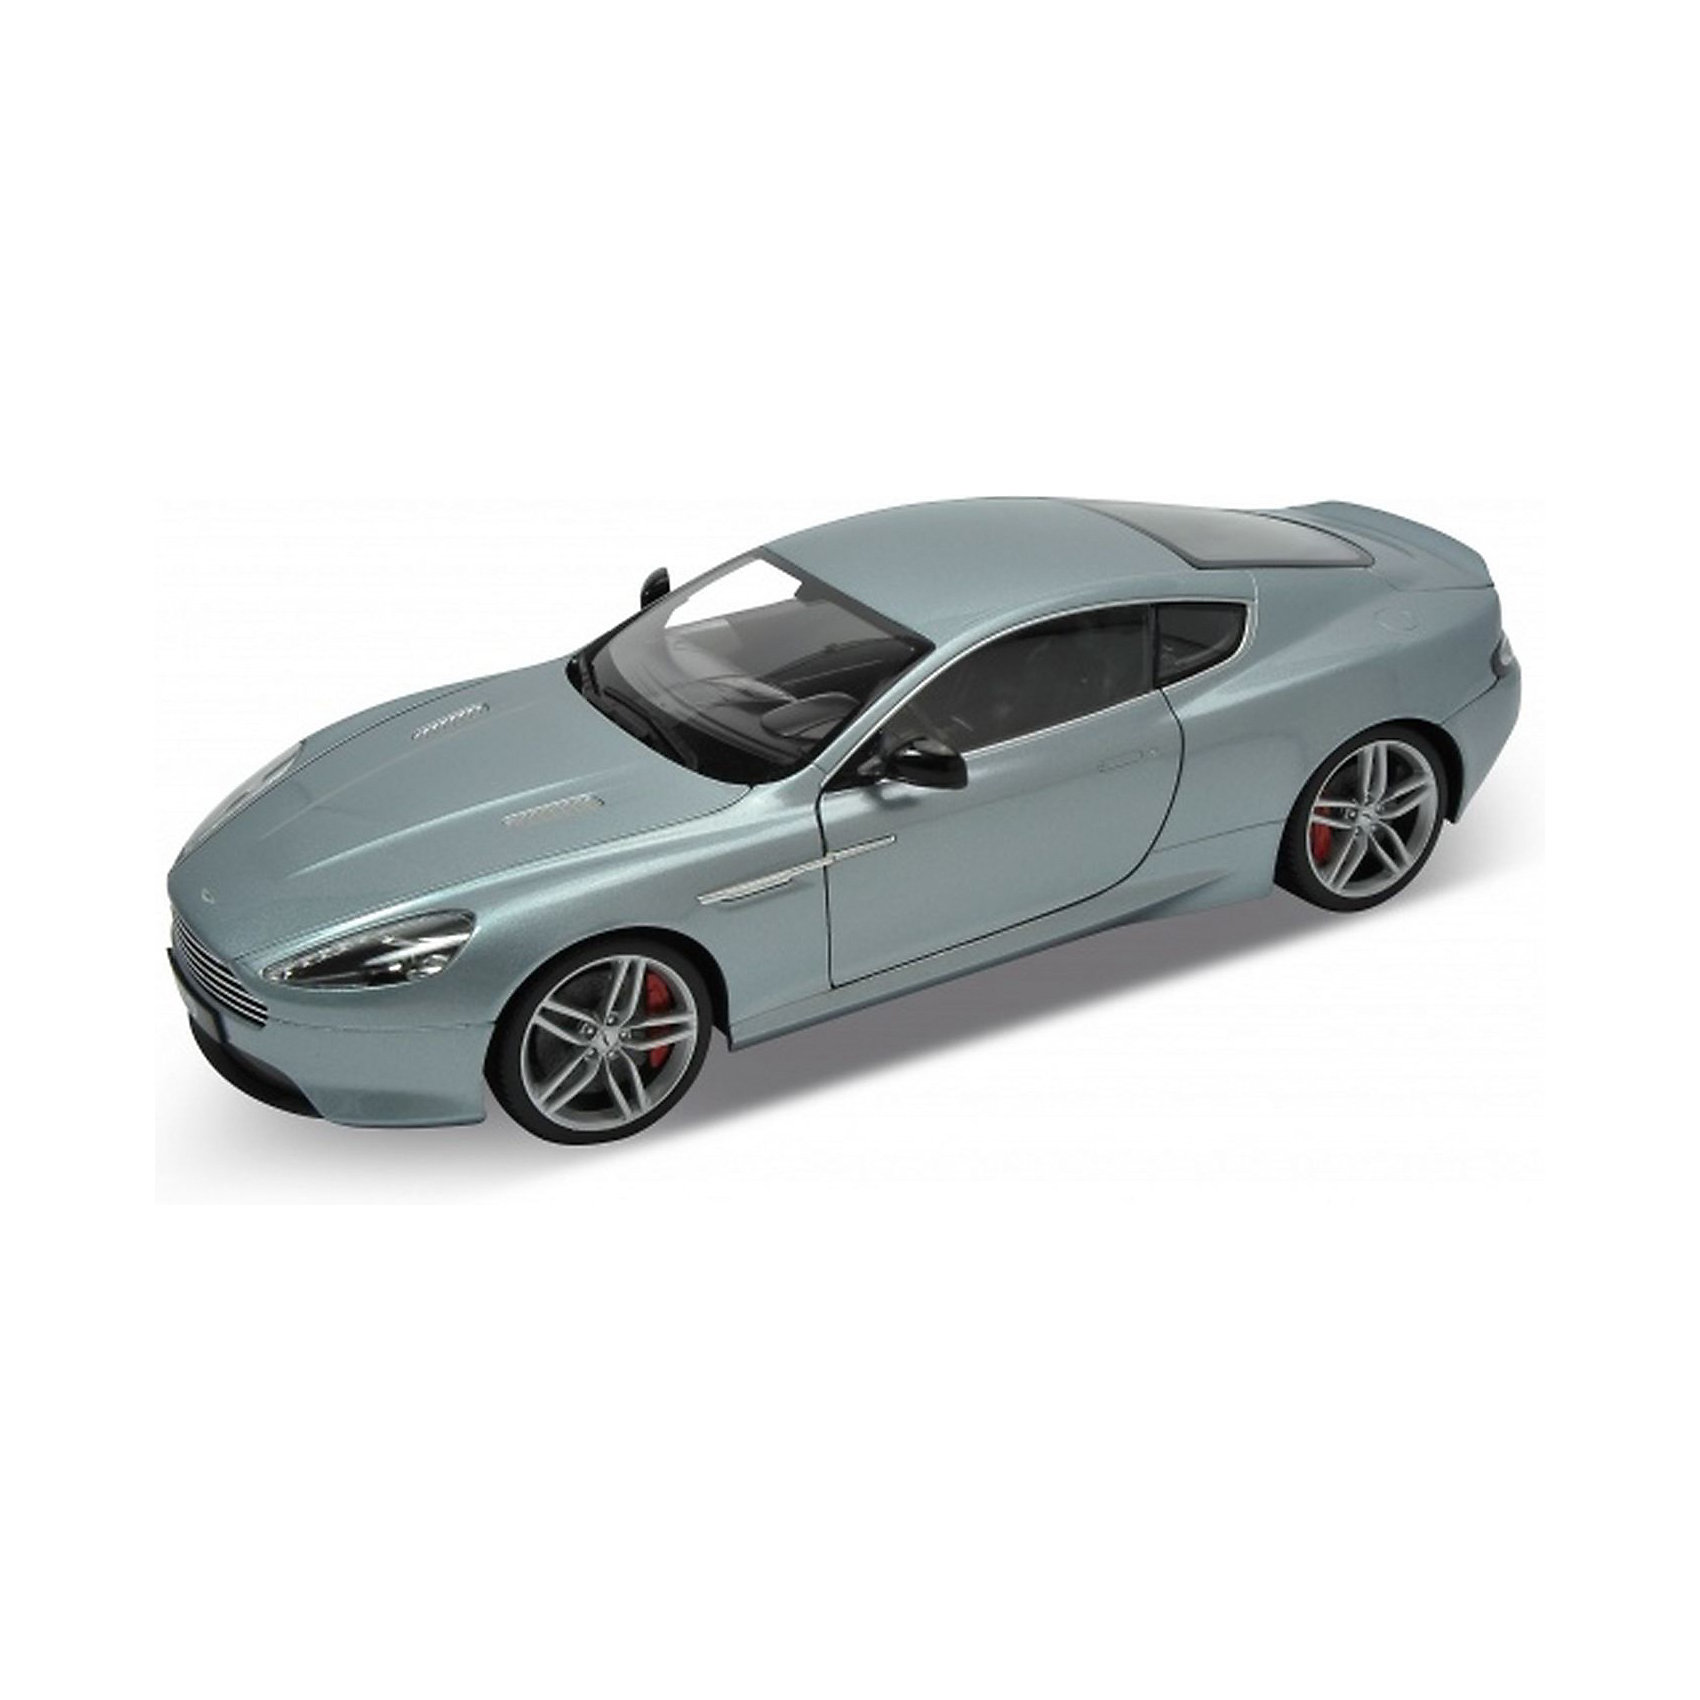 Welly Модель машины 1:18 Aston Martin DB9, Welly welly модель машины 1 24 aston martin v12 vantage welly